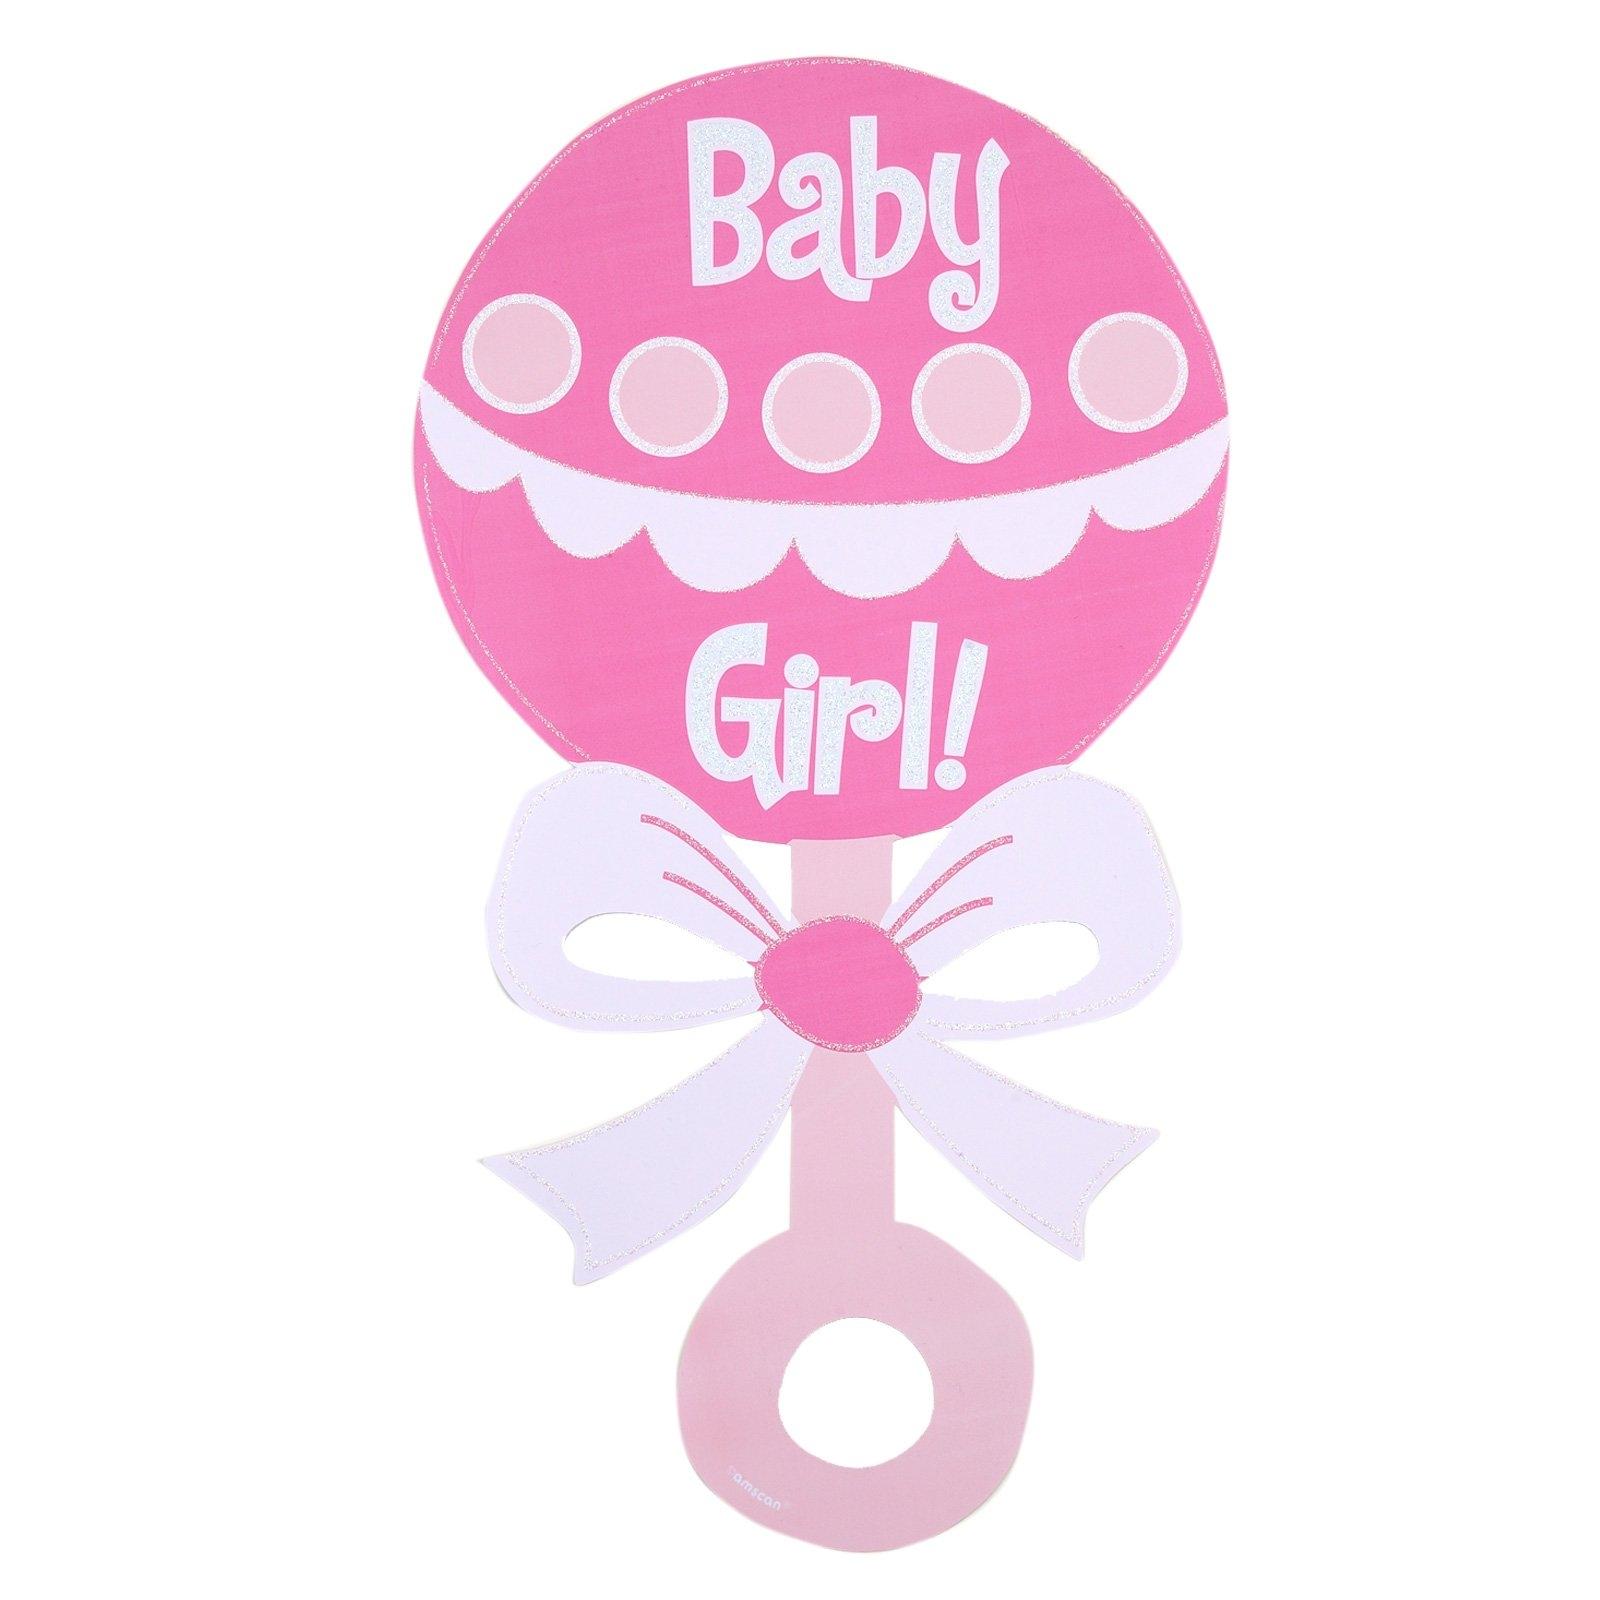 Baby clipart girl free clip art transparent Baby Girl Clipart & Baby Girl Clip Art Images - ClipartALL.com clip art transparent